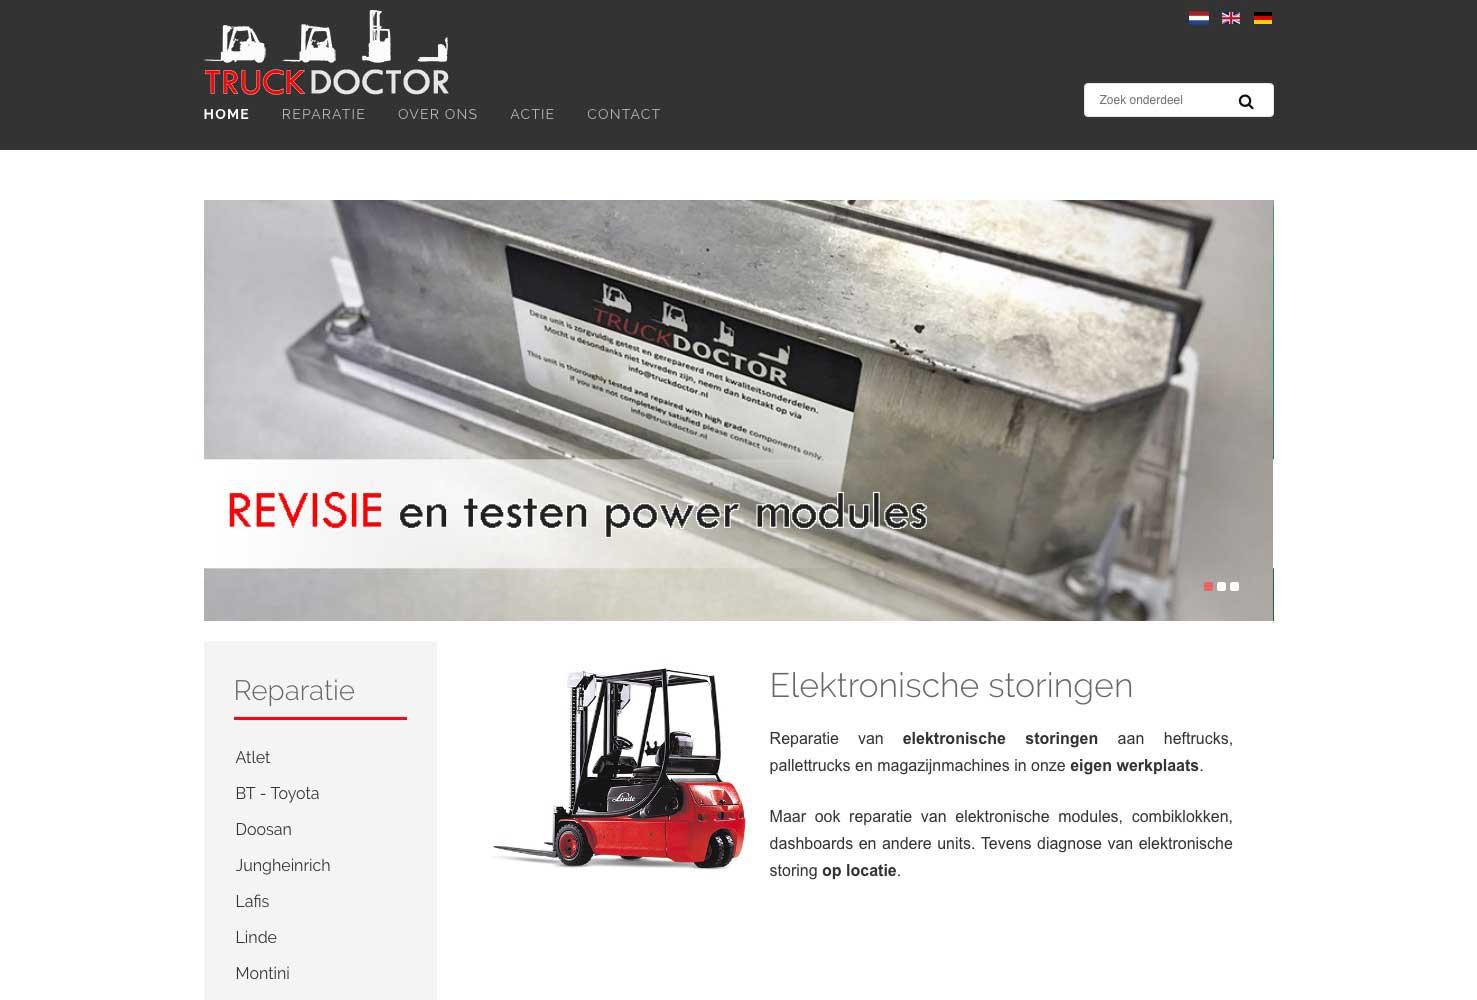 Truckdoctor